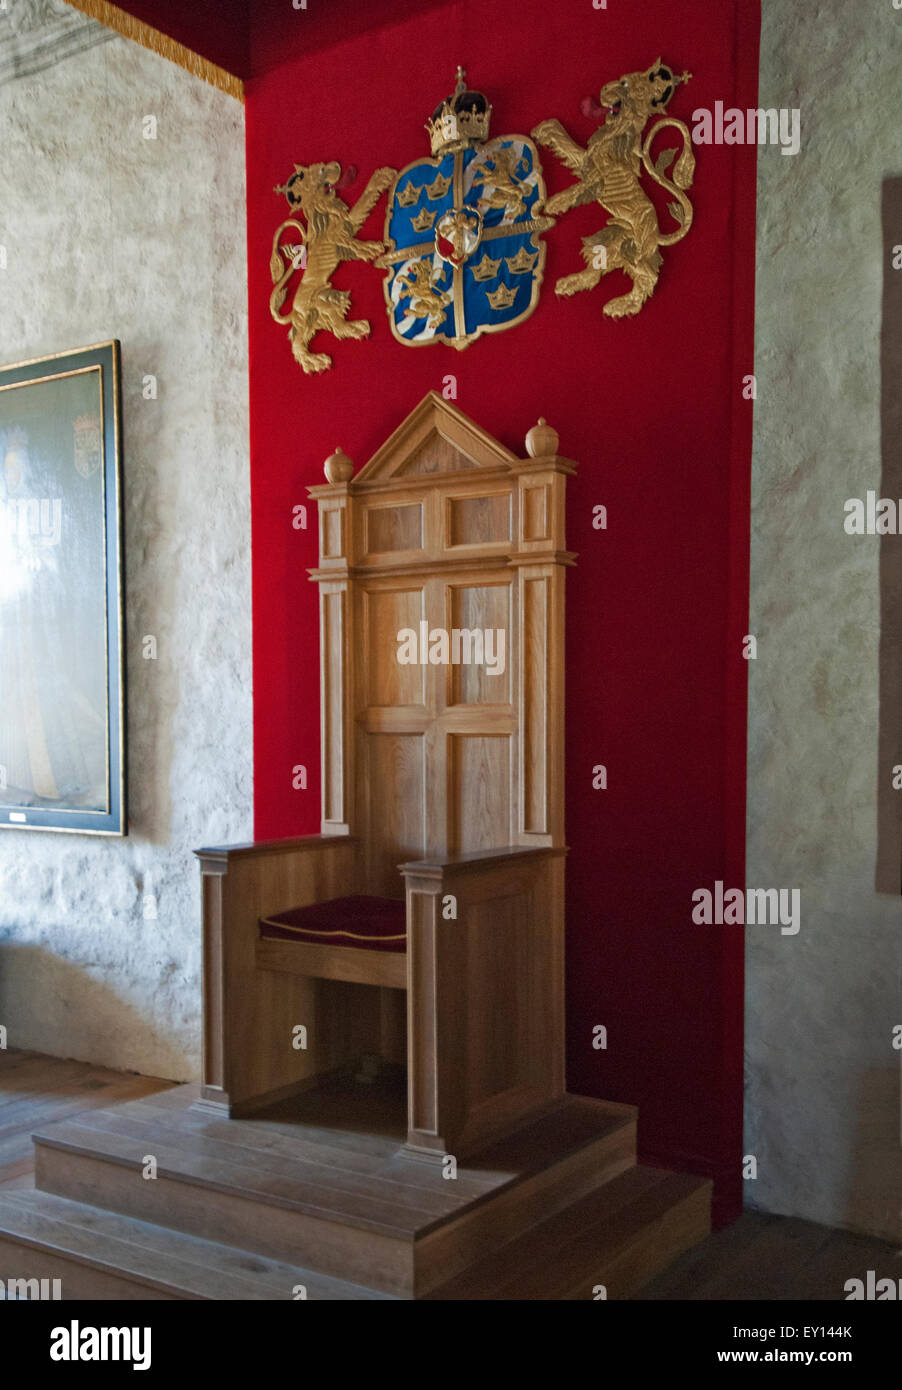 Throne in Kalmar Castle - Stock Image